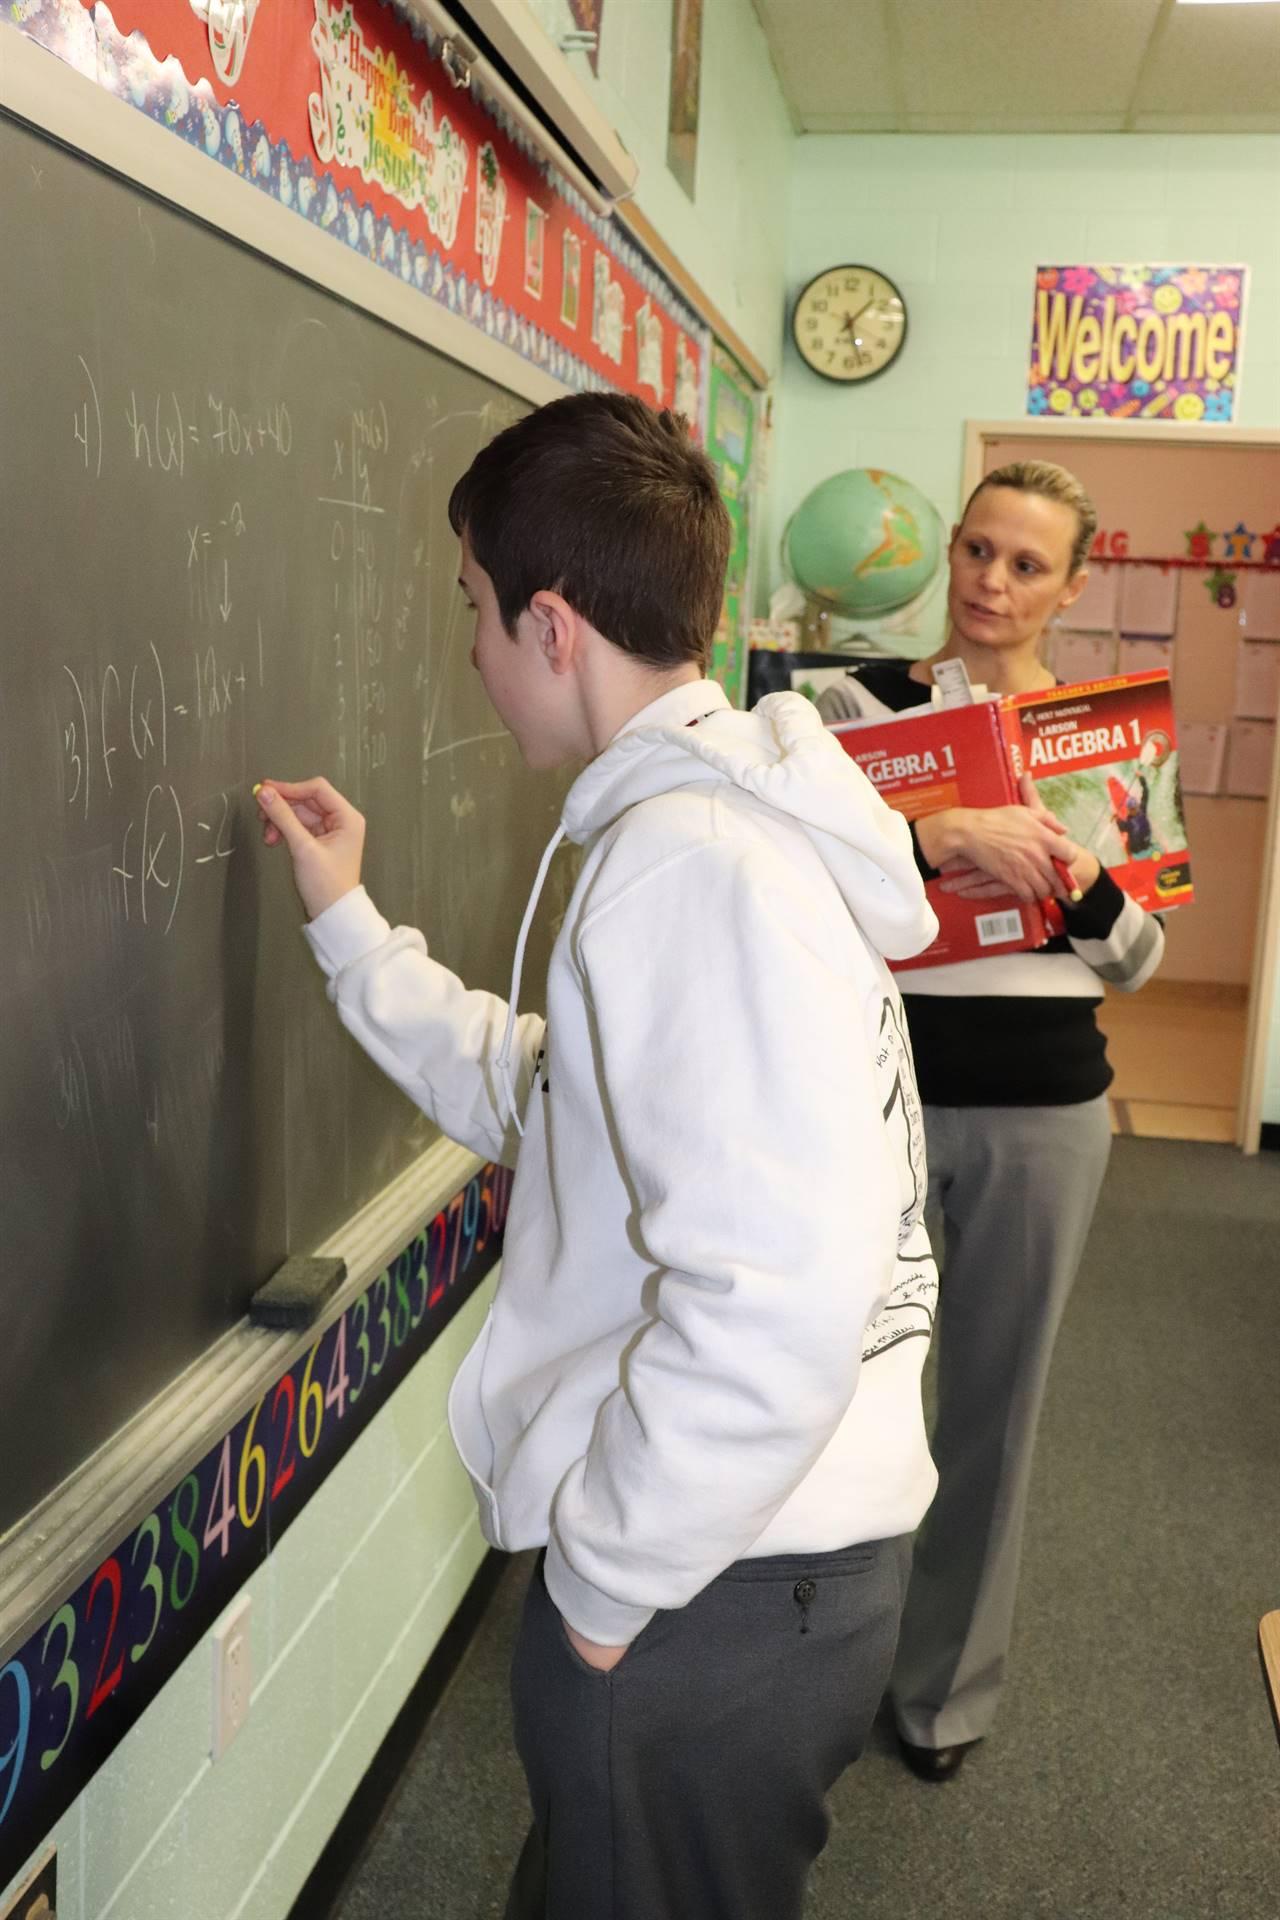 Student and Teacher in Math class